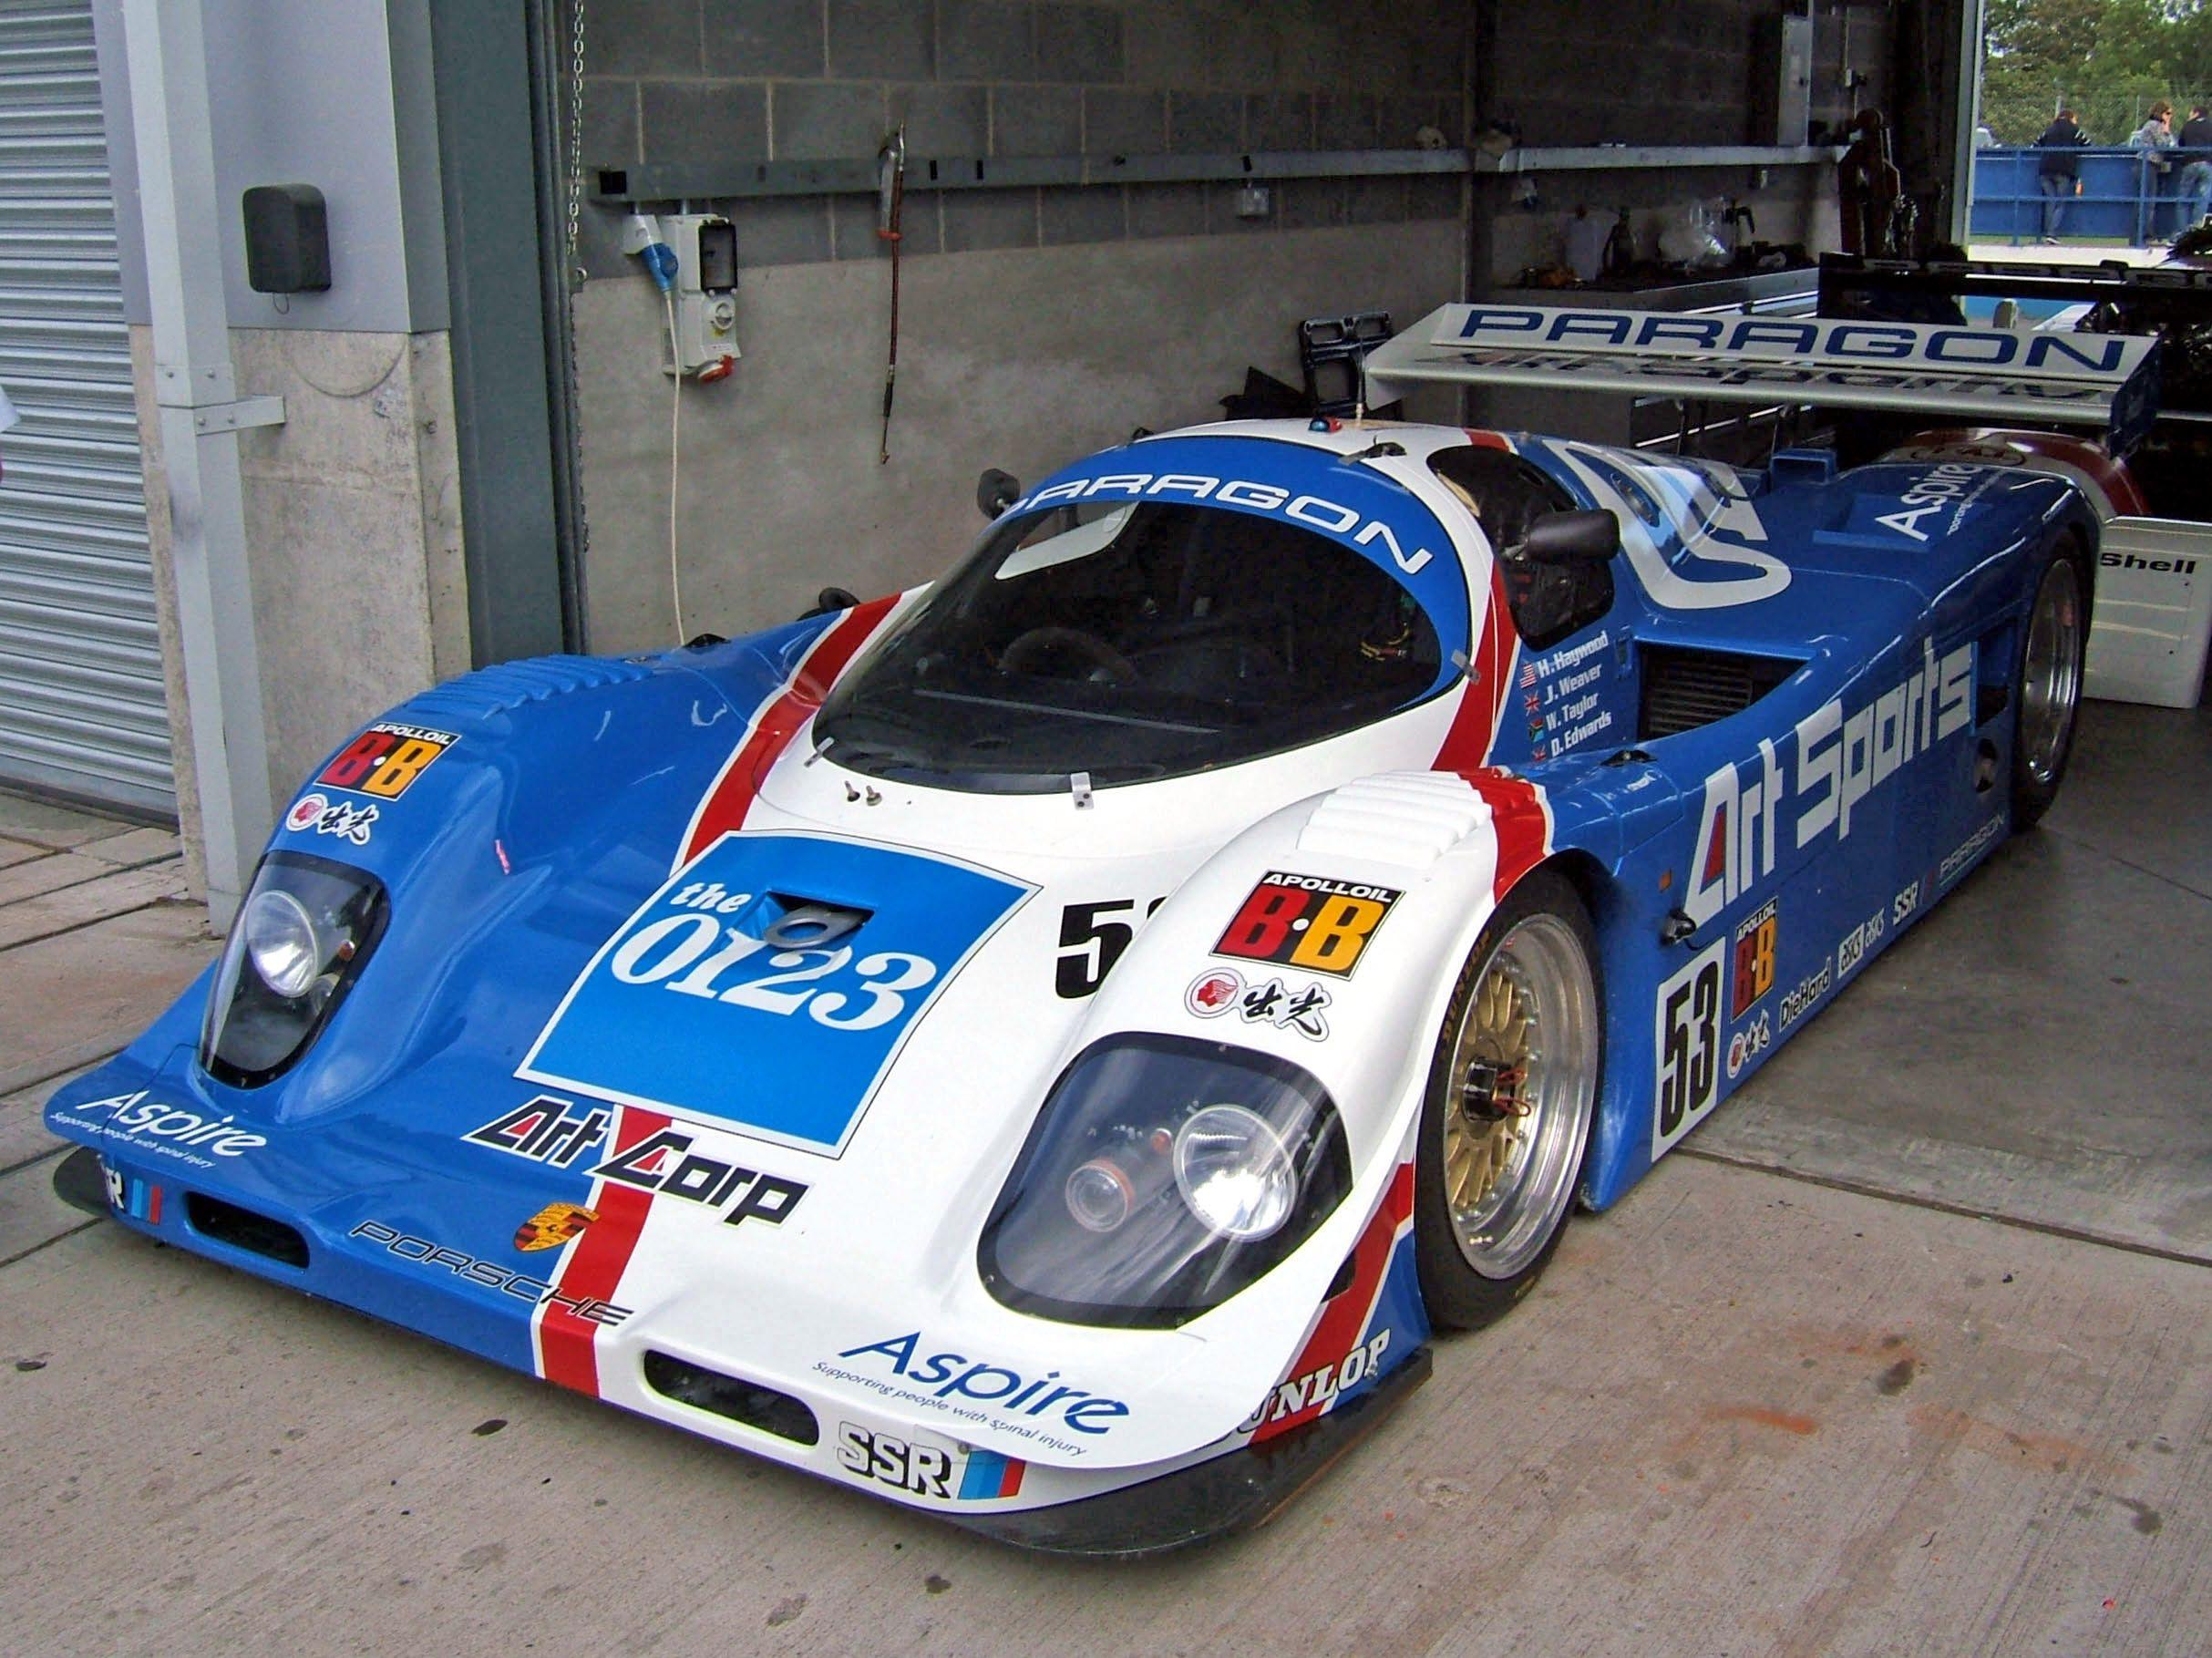 Pin by tony garavetto on transportation   Porsche, Porsche ...